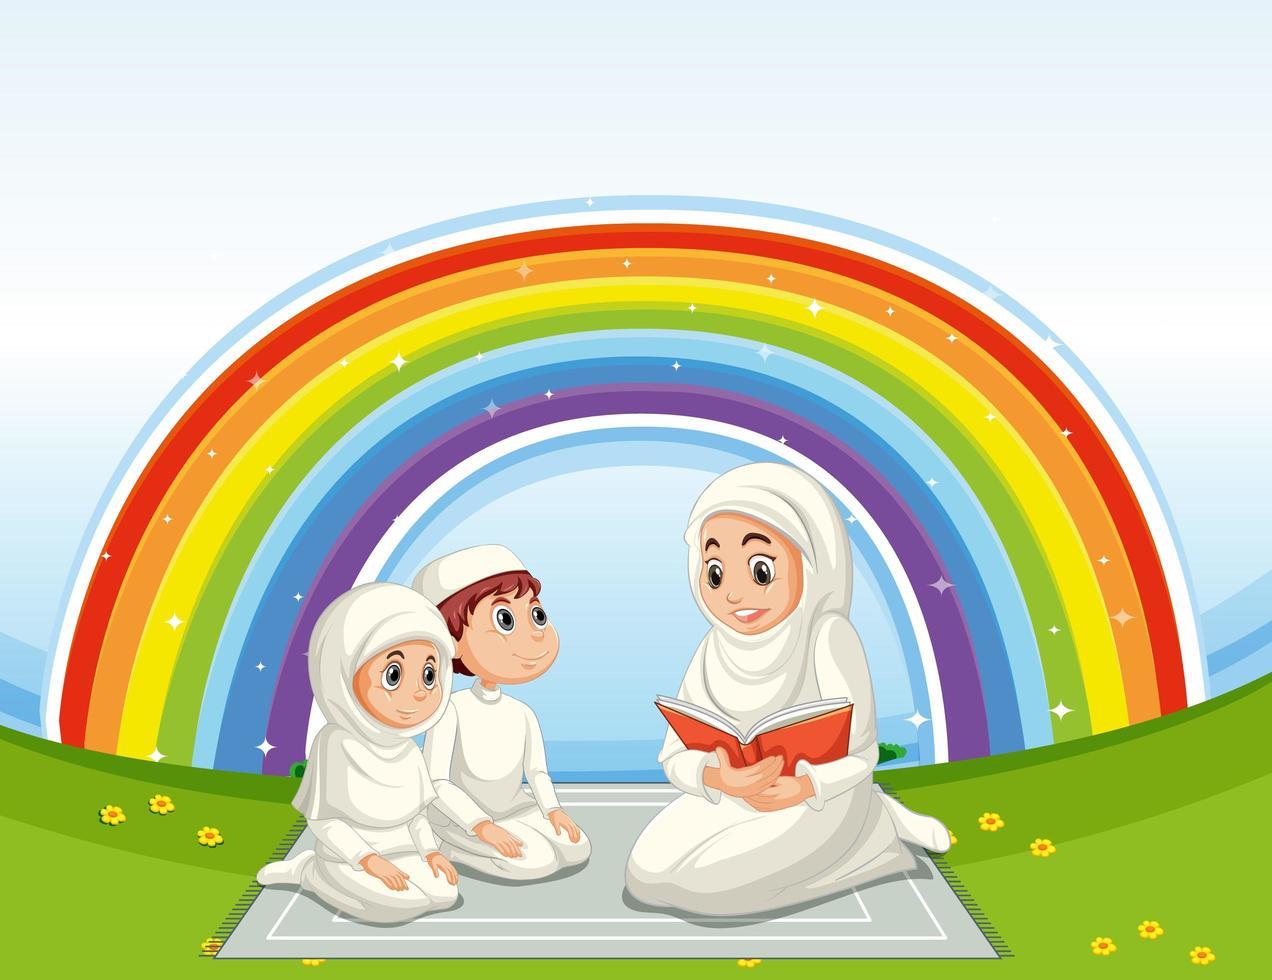 famille musulmane arabe en costume traditionnel vecteur